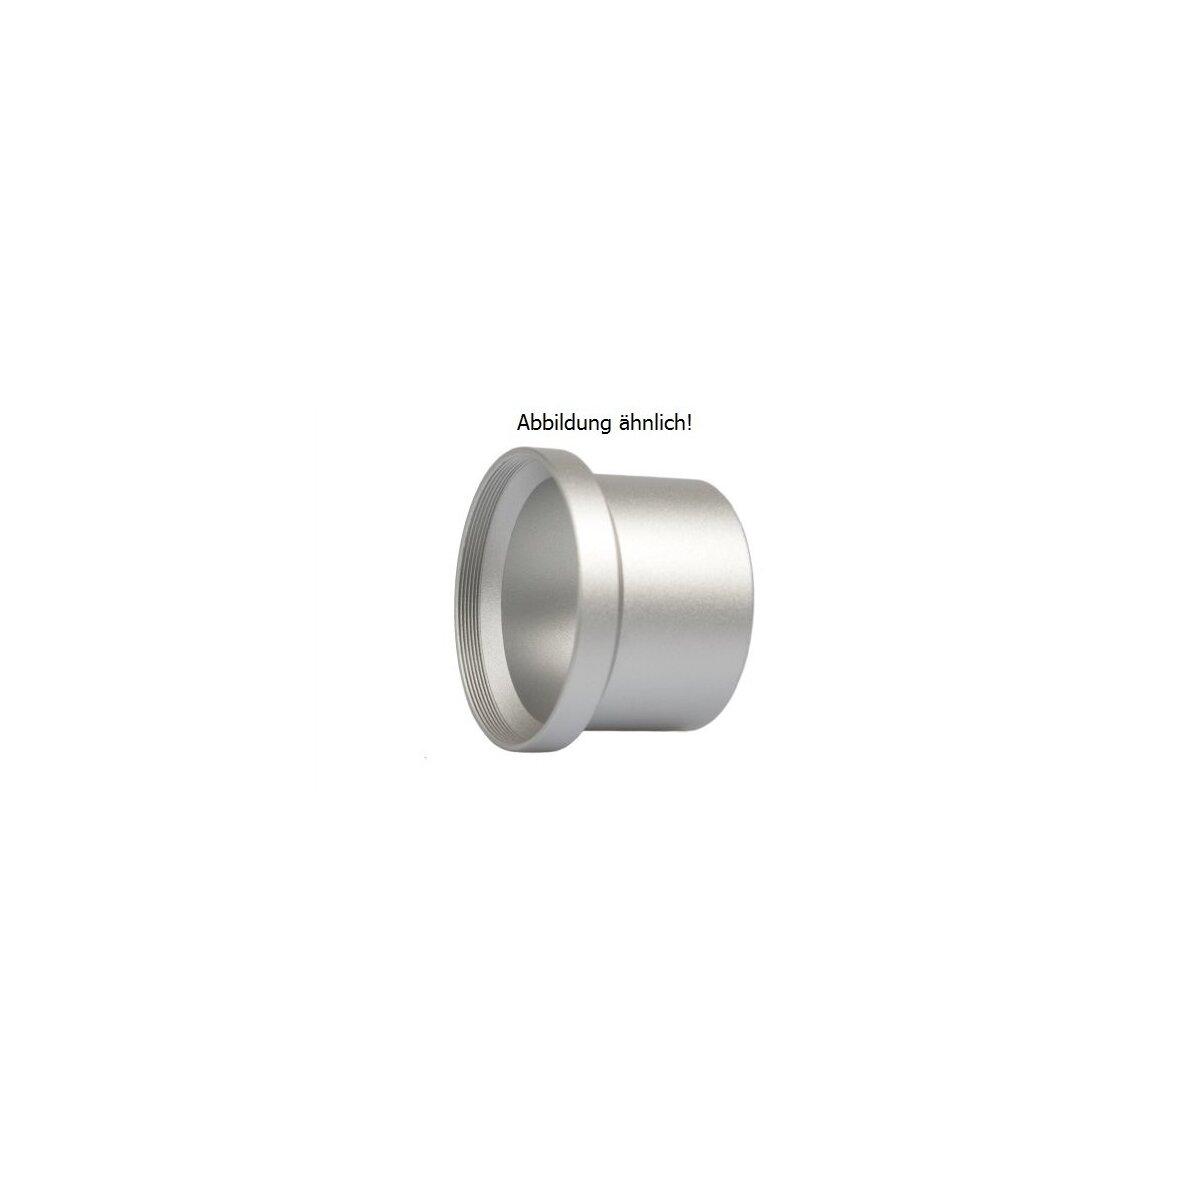 Adaptertubus fuer Canon PowerShot A60, A70, A75, A85